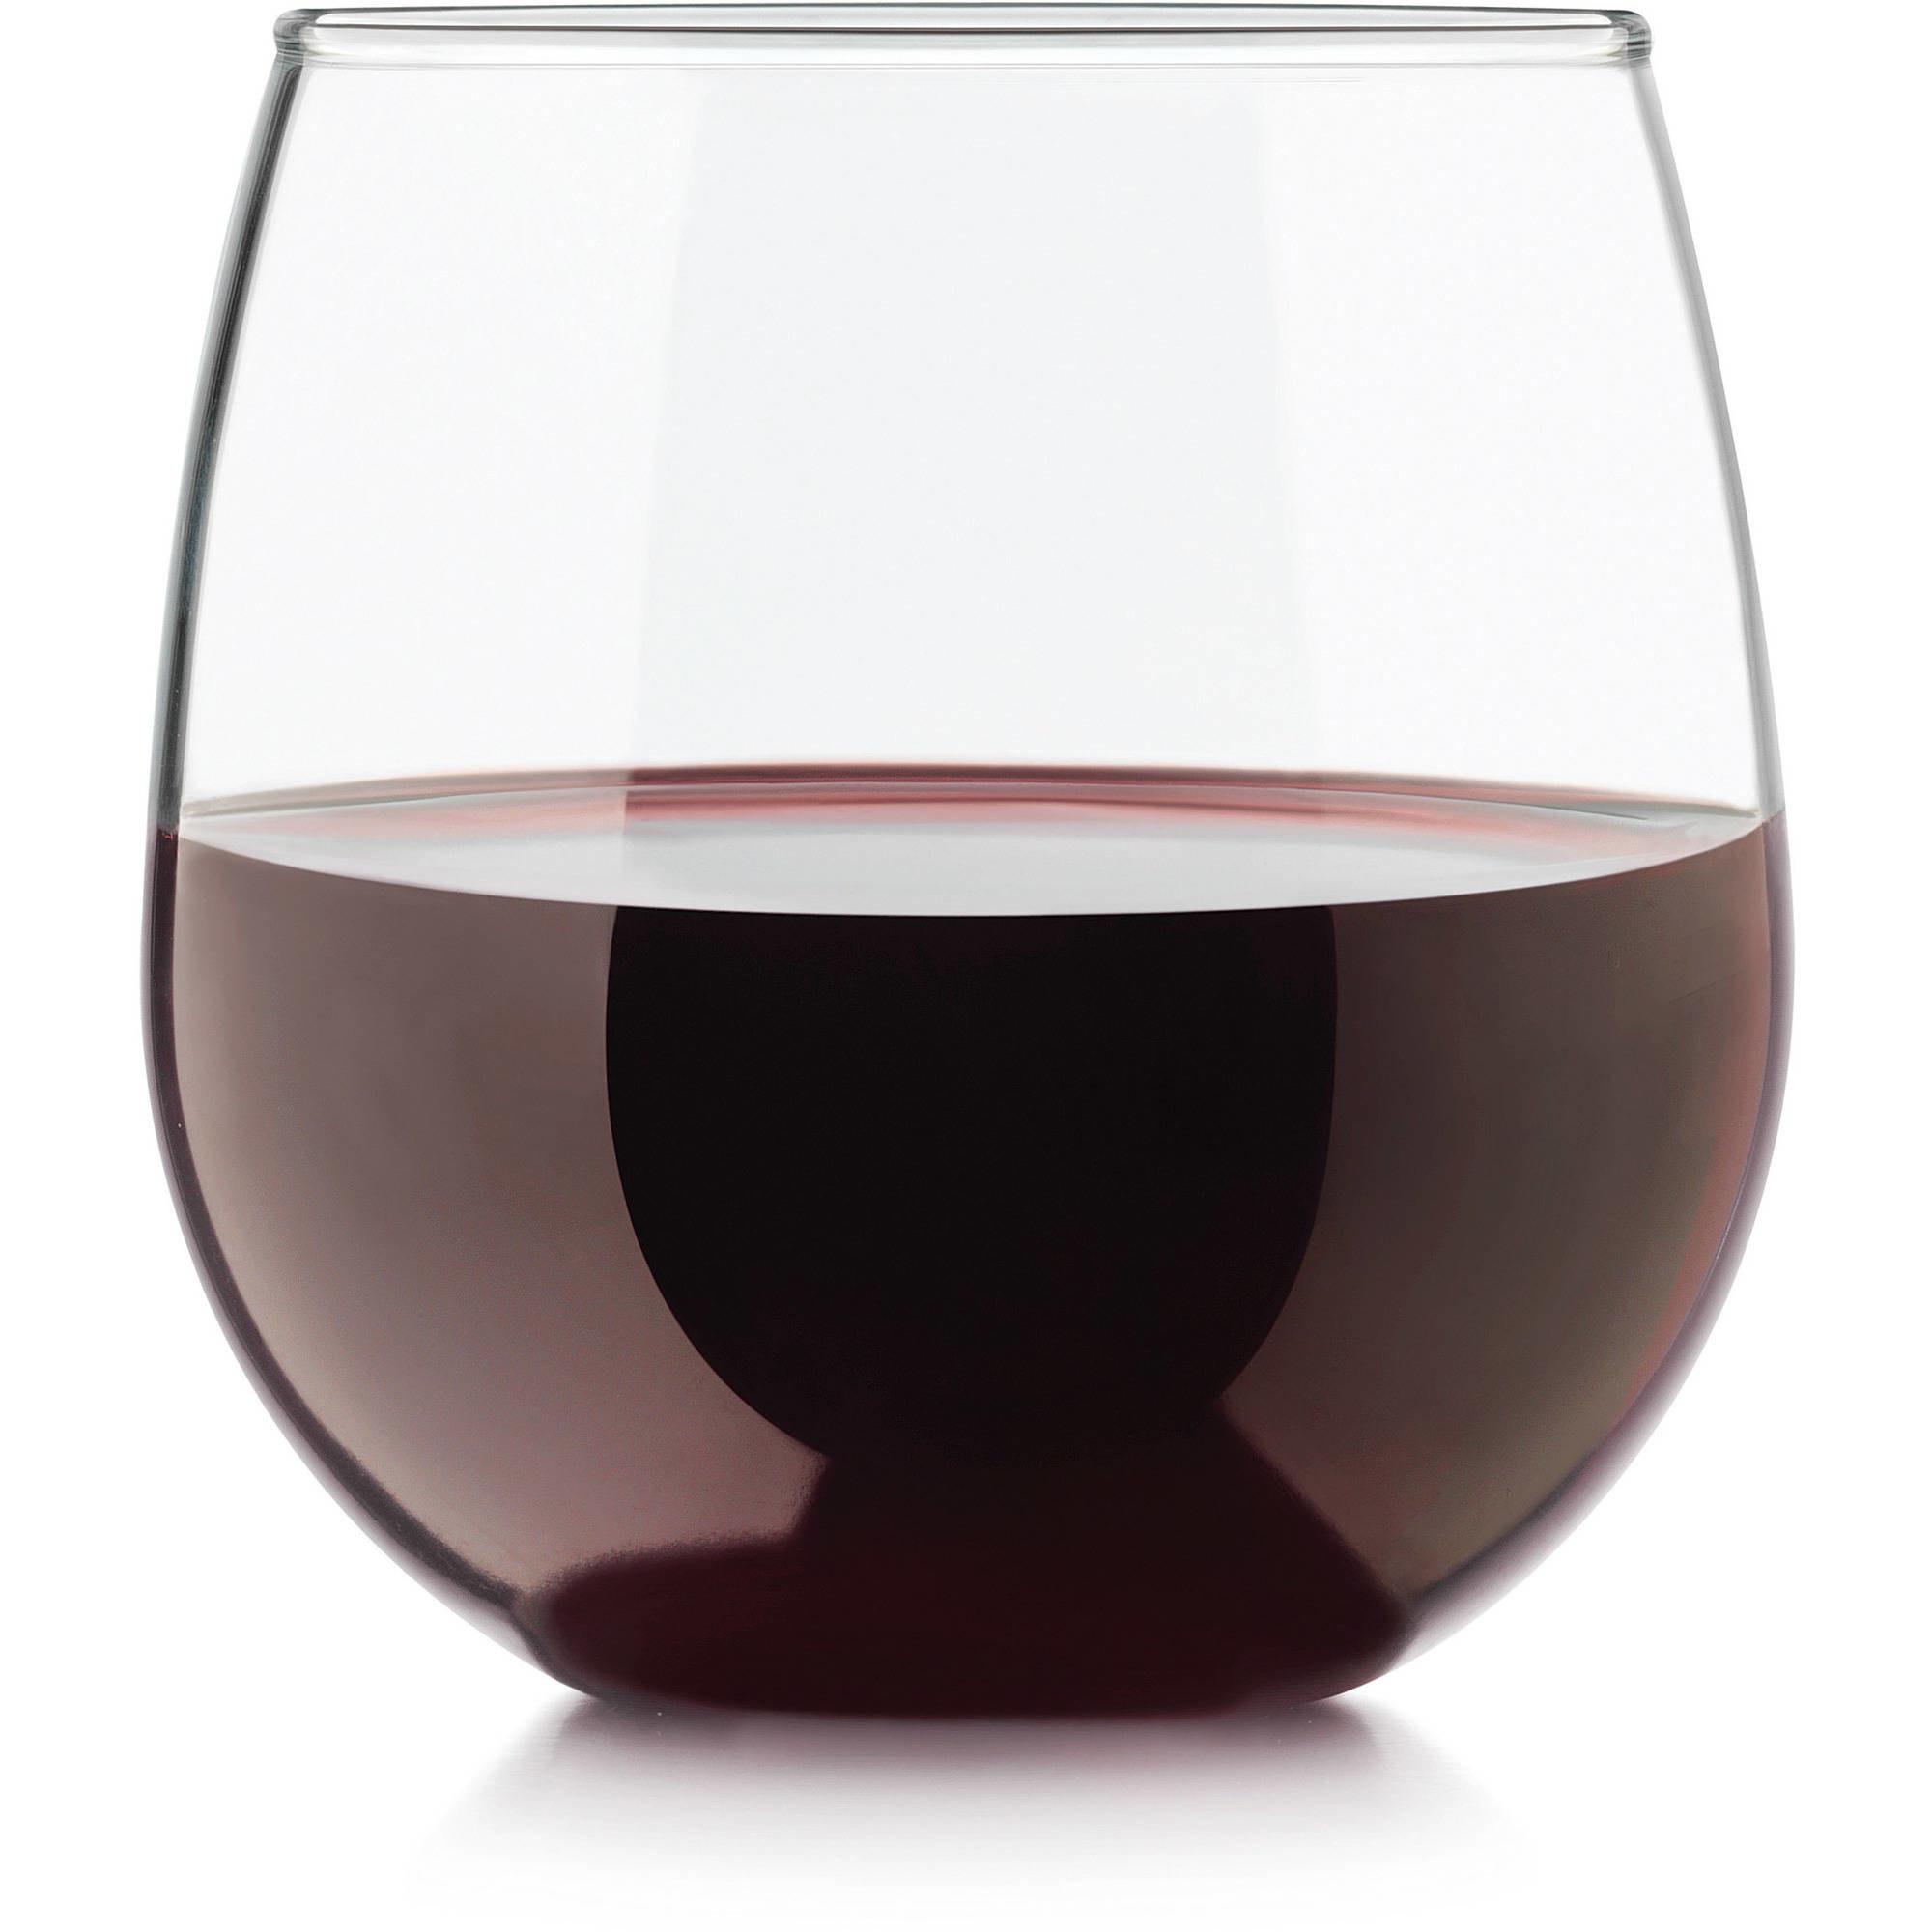 a wine glass with wine inside